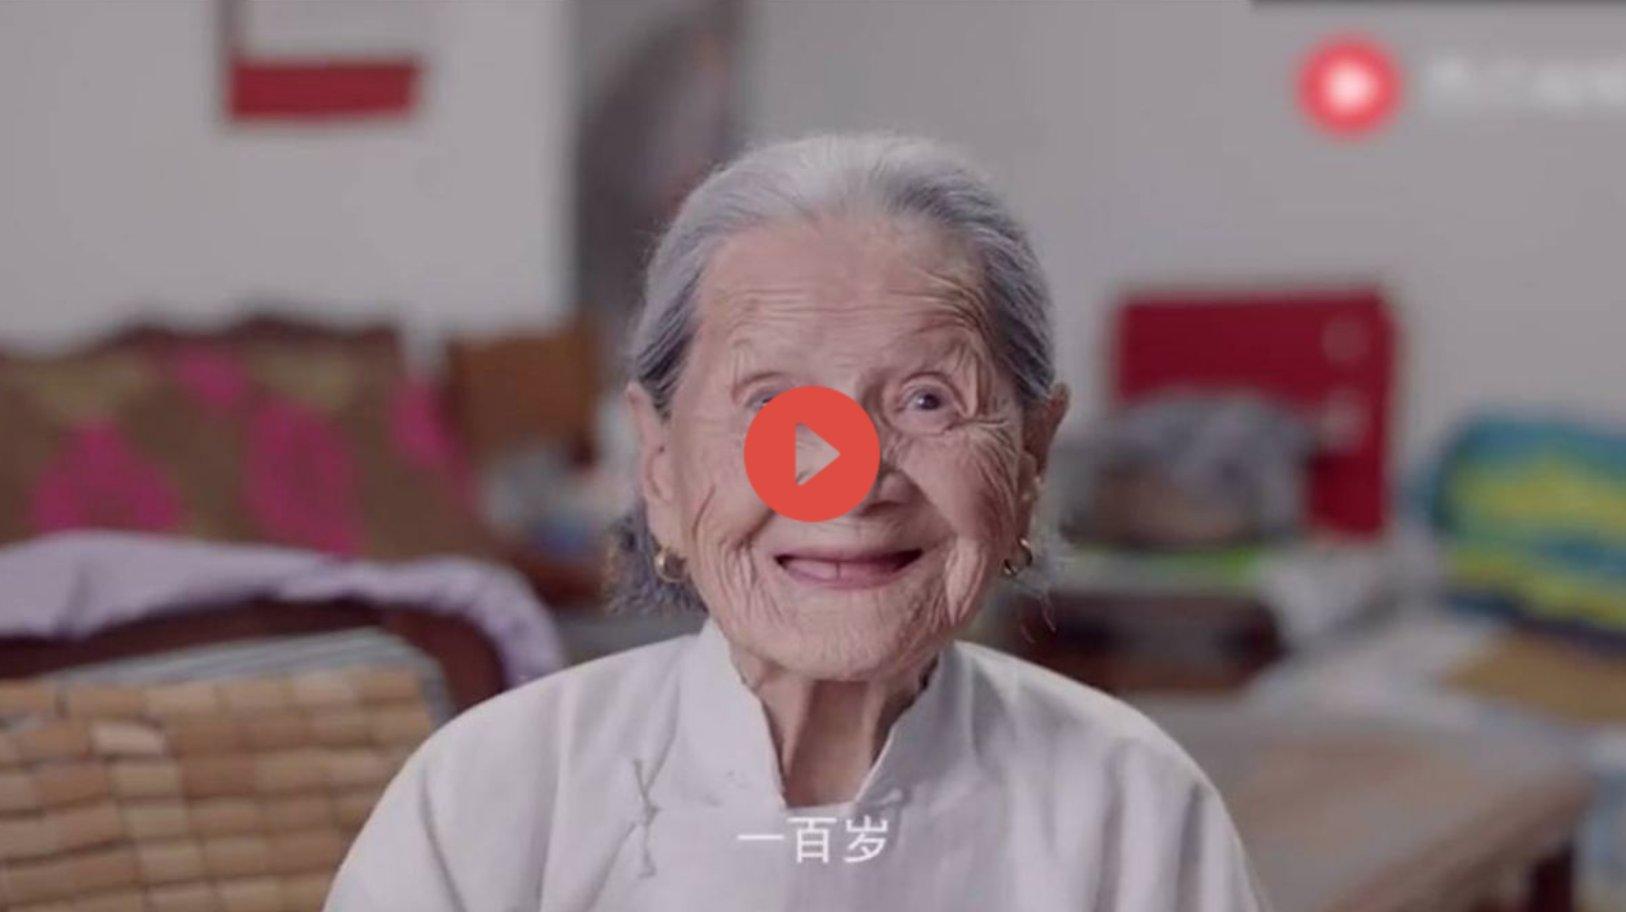 screen shot 2018 10 04 at 3 04 48 pm.png?resize=412,232 - 120秒紀錄女性1-100歲變化...網友鼻酸感嘆:「這就是人生啊~」